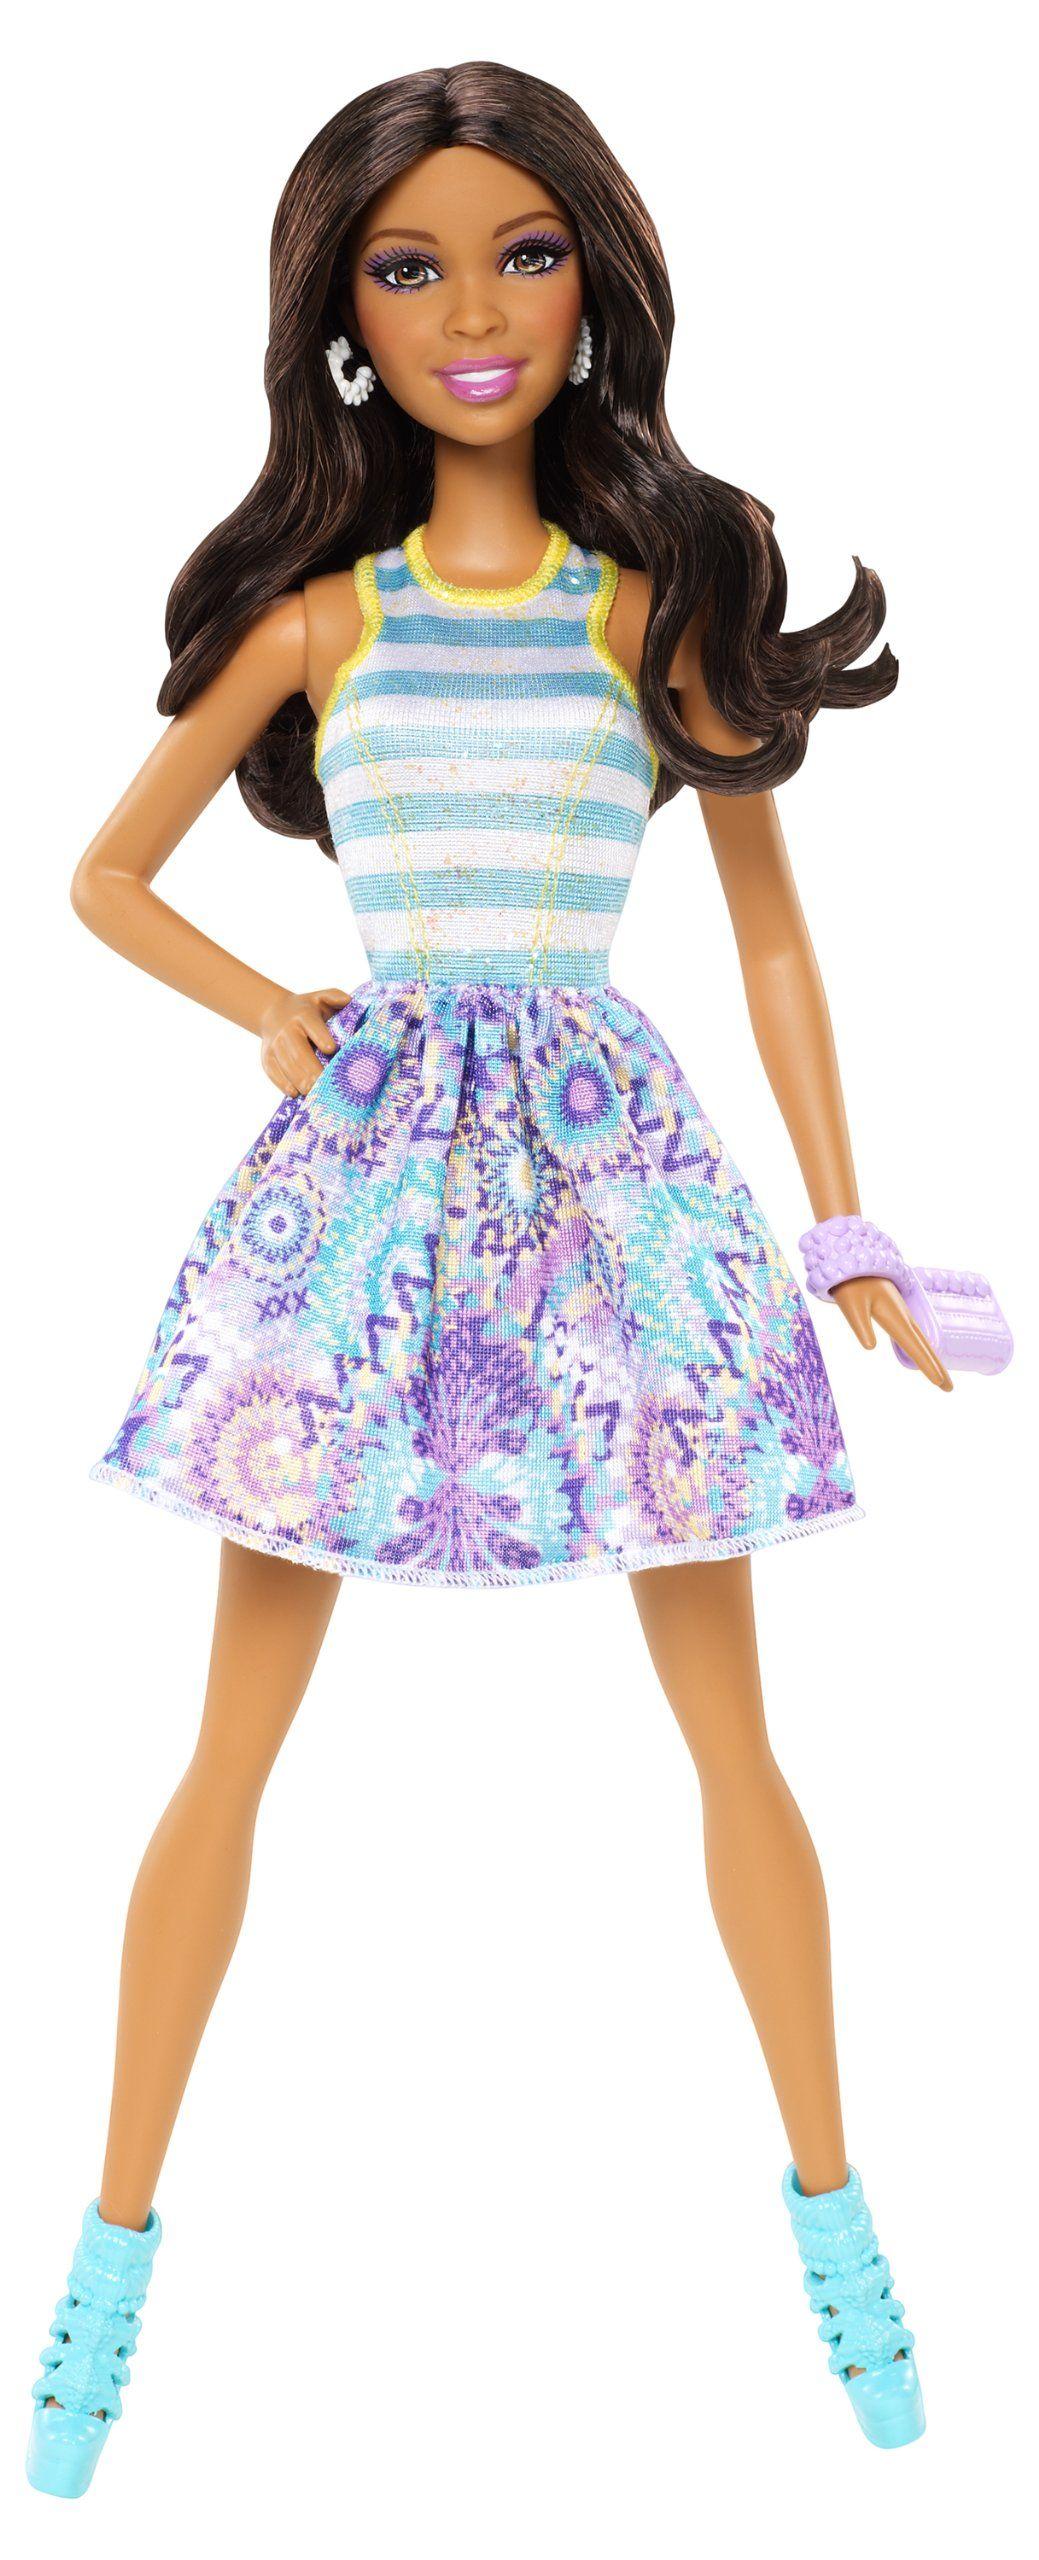 Barbie fashionistas nikki doll